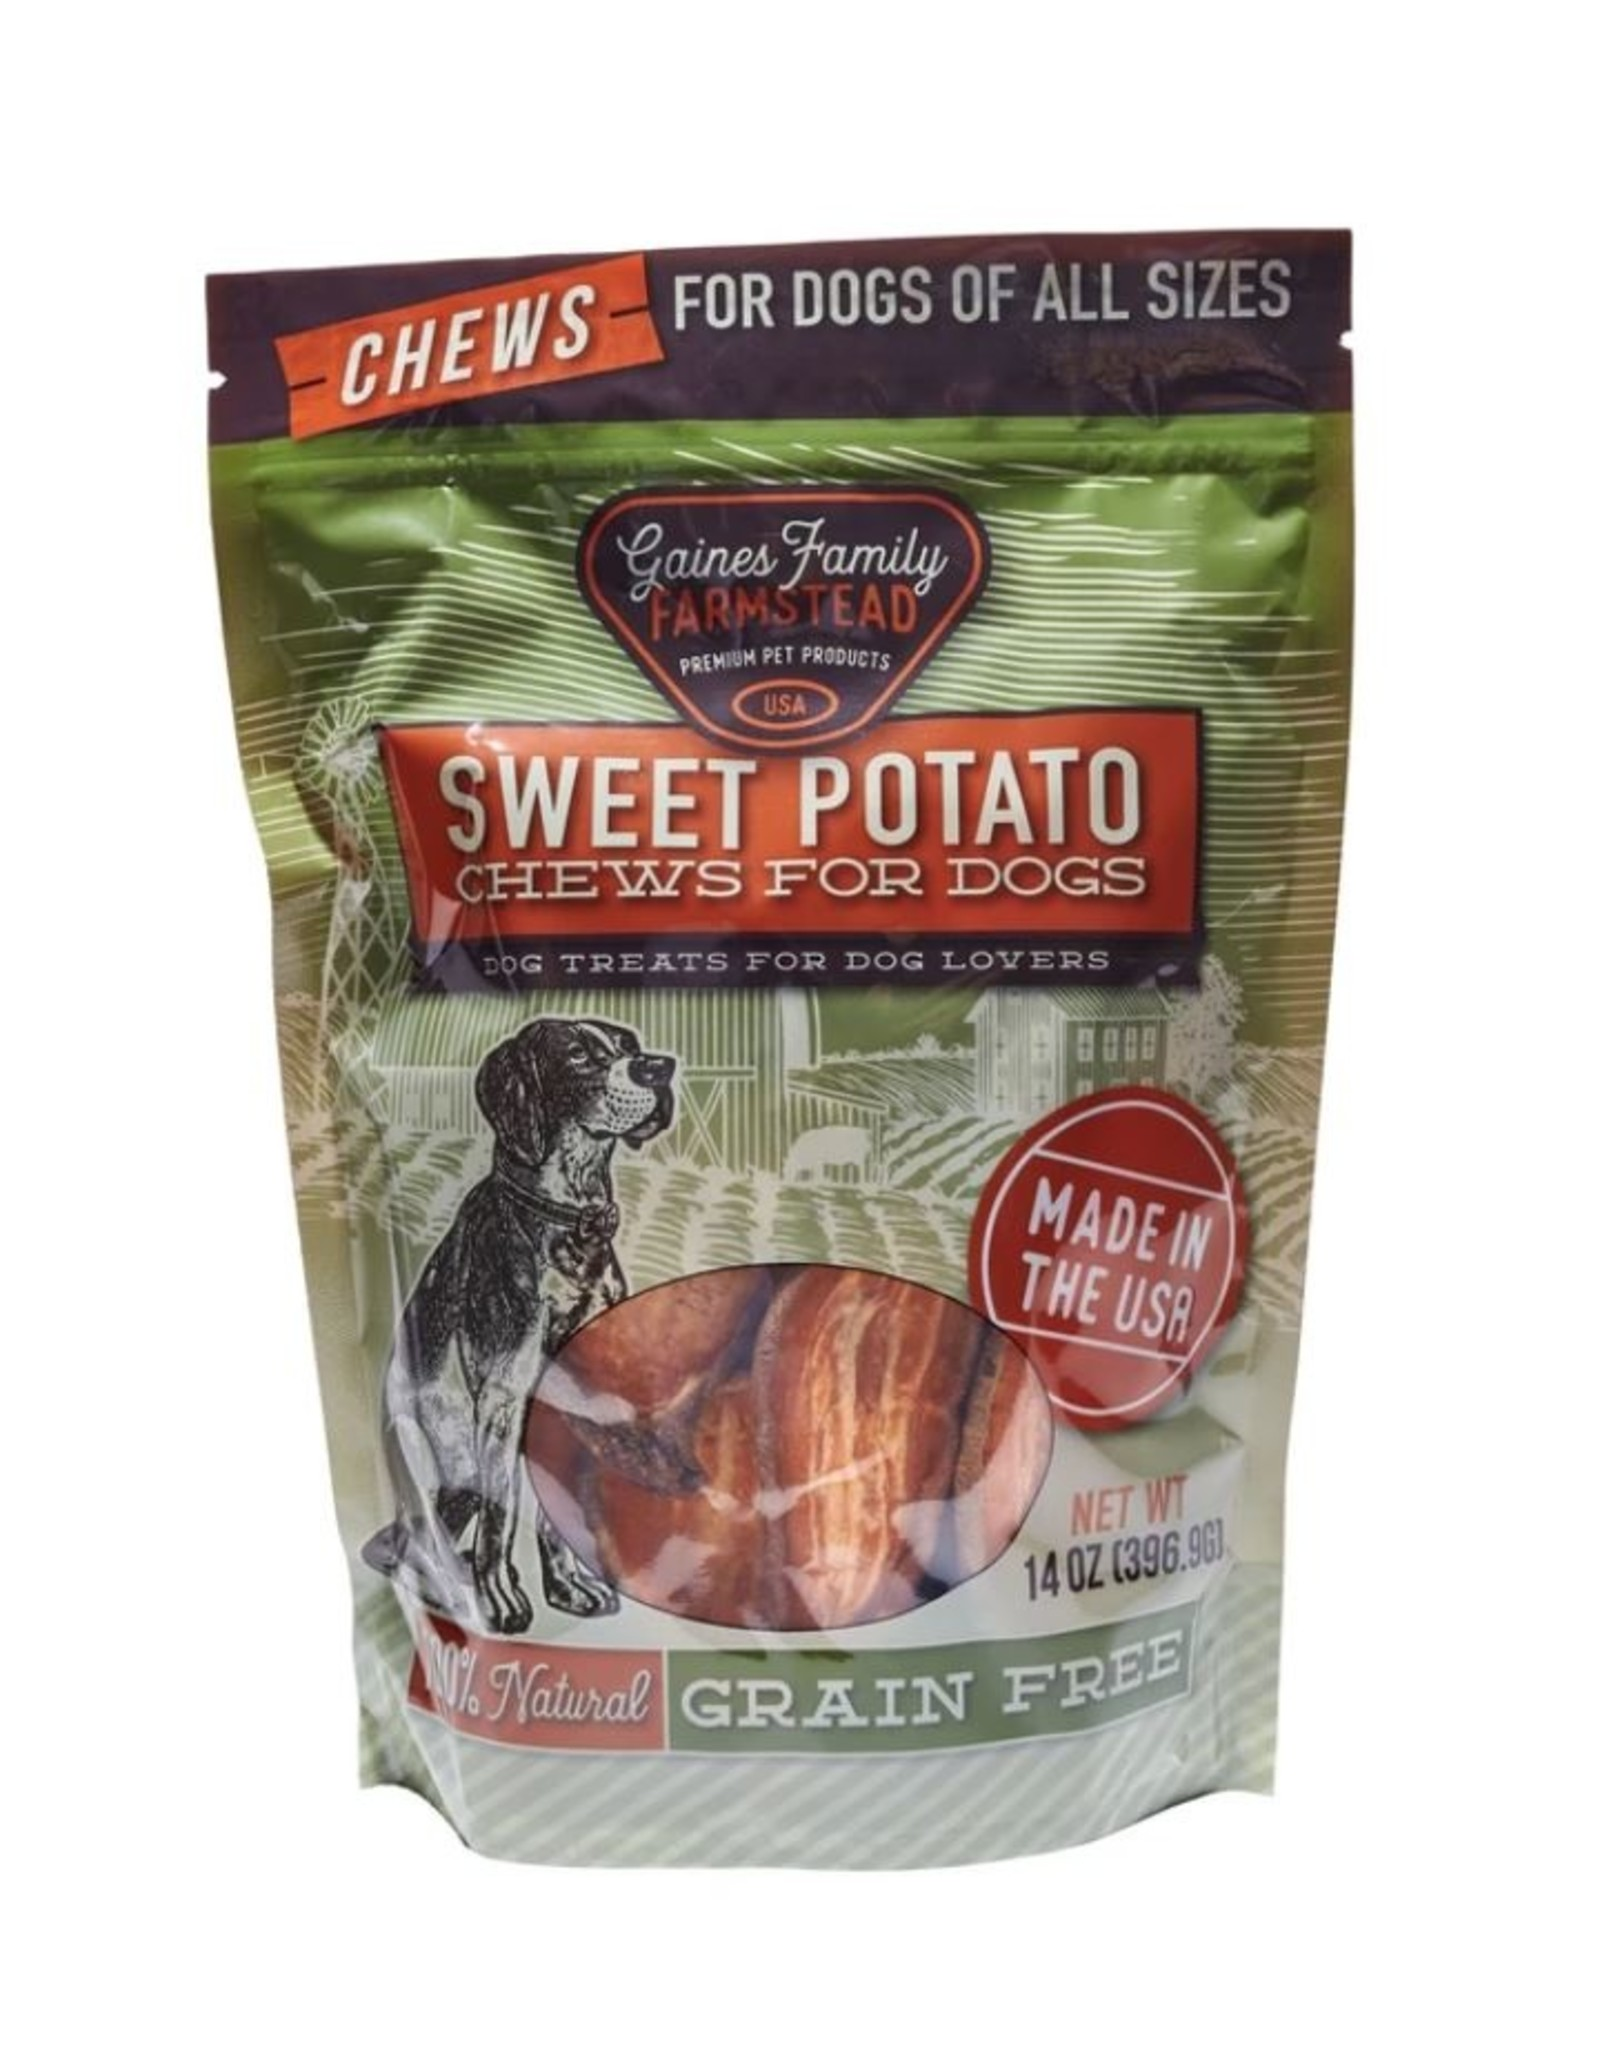 Gaines Family Farmstead Gaines Family Farmstead Sweet Potato Chews